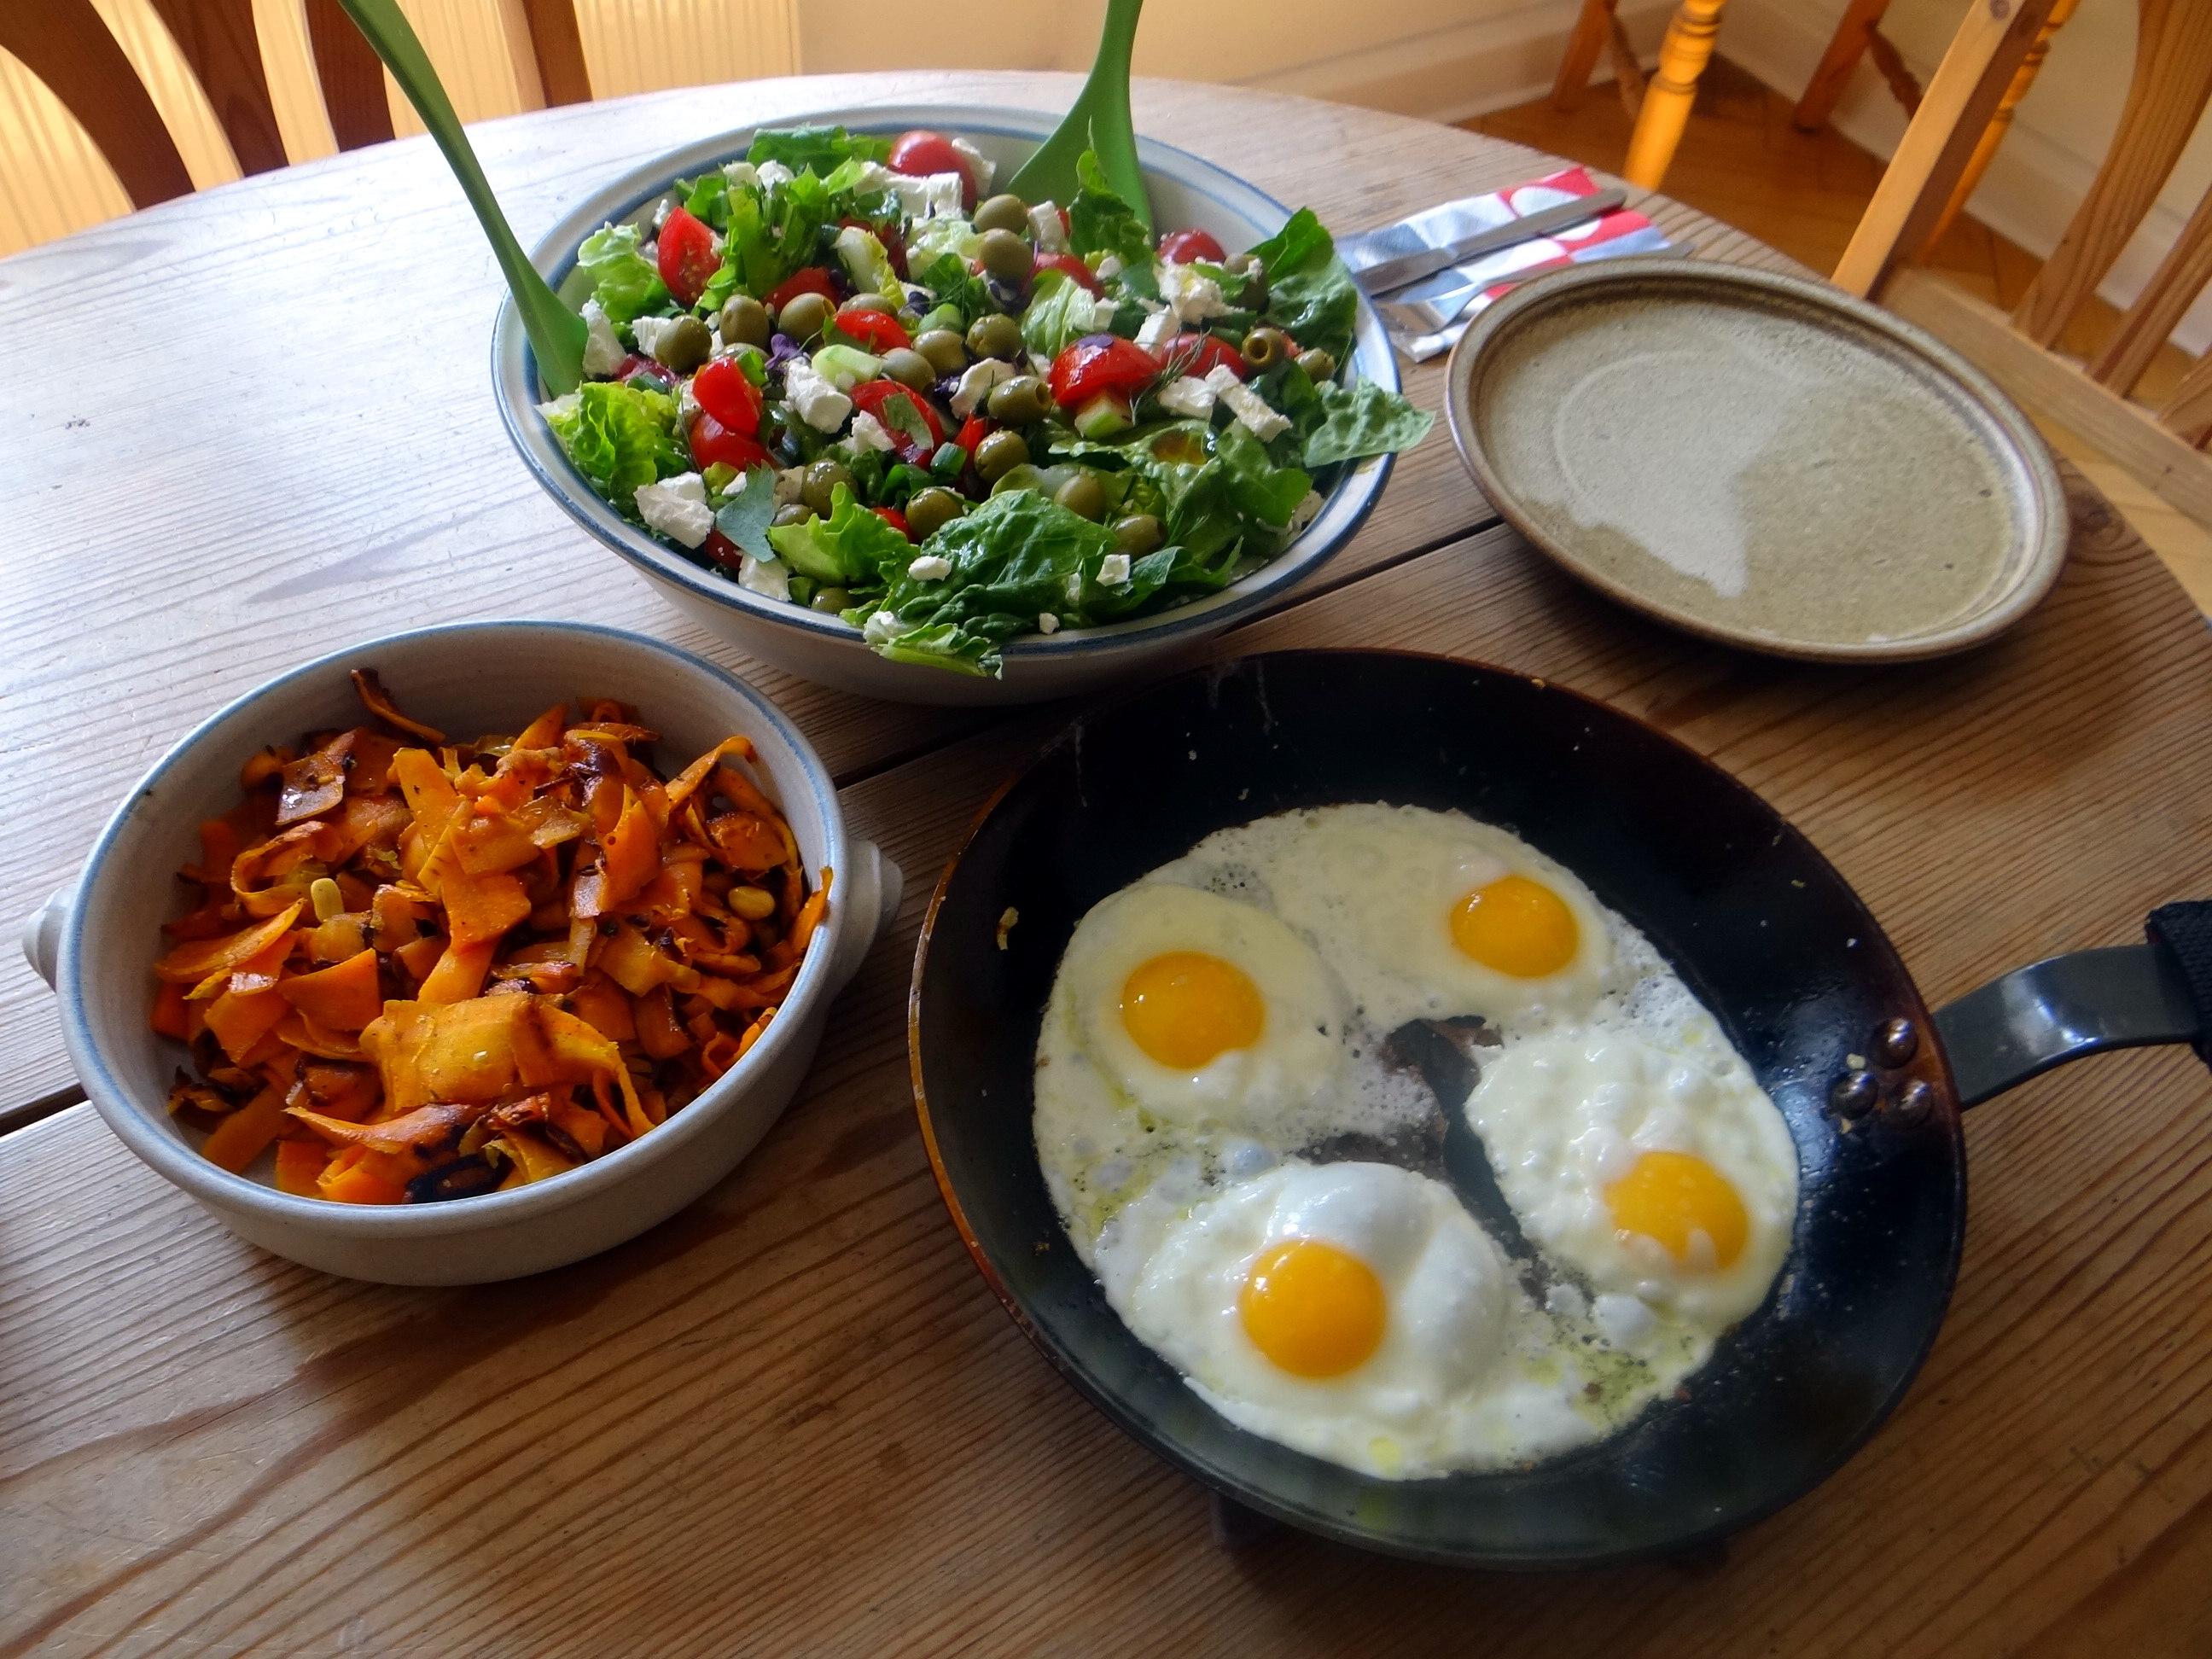 Salat,Karotten,Bratkartoffeln,Spiegelei (20)